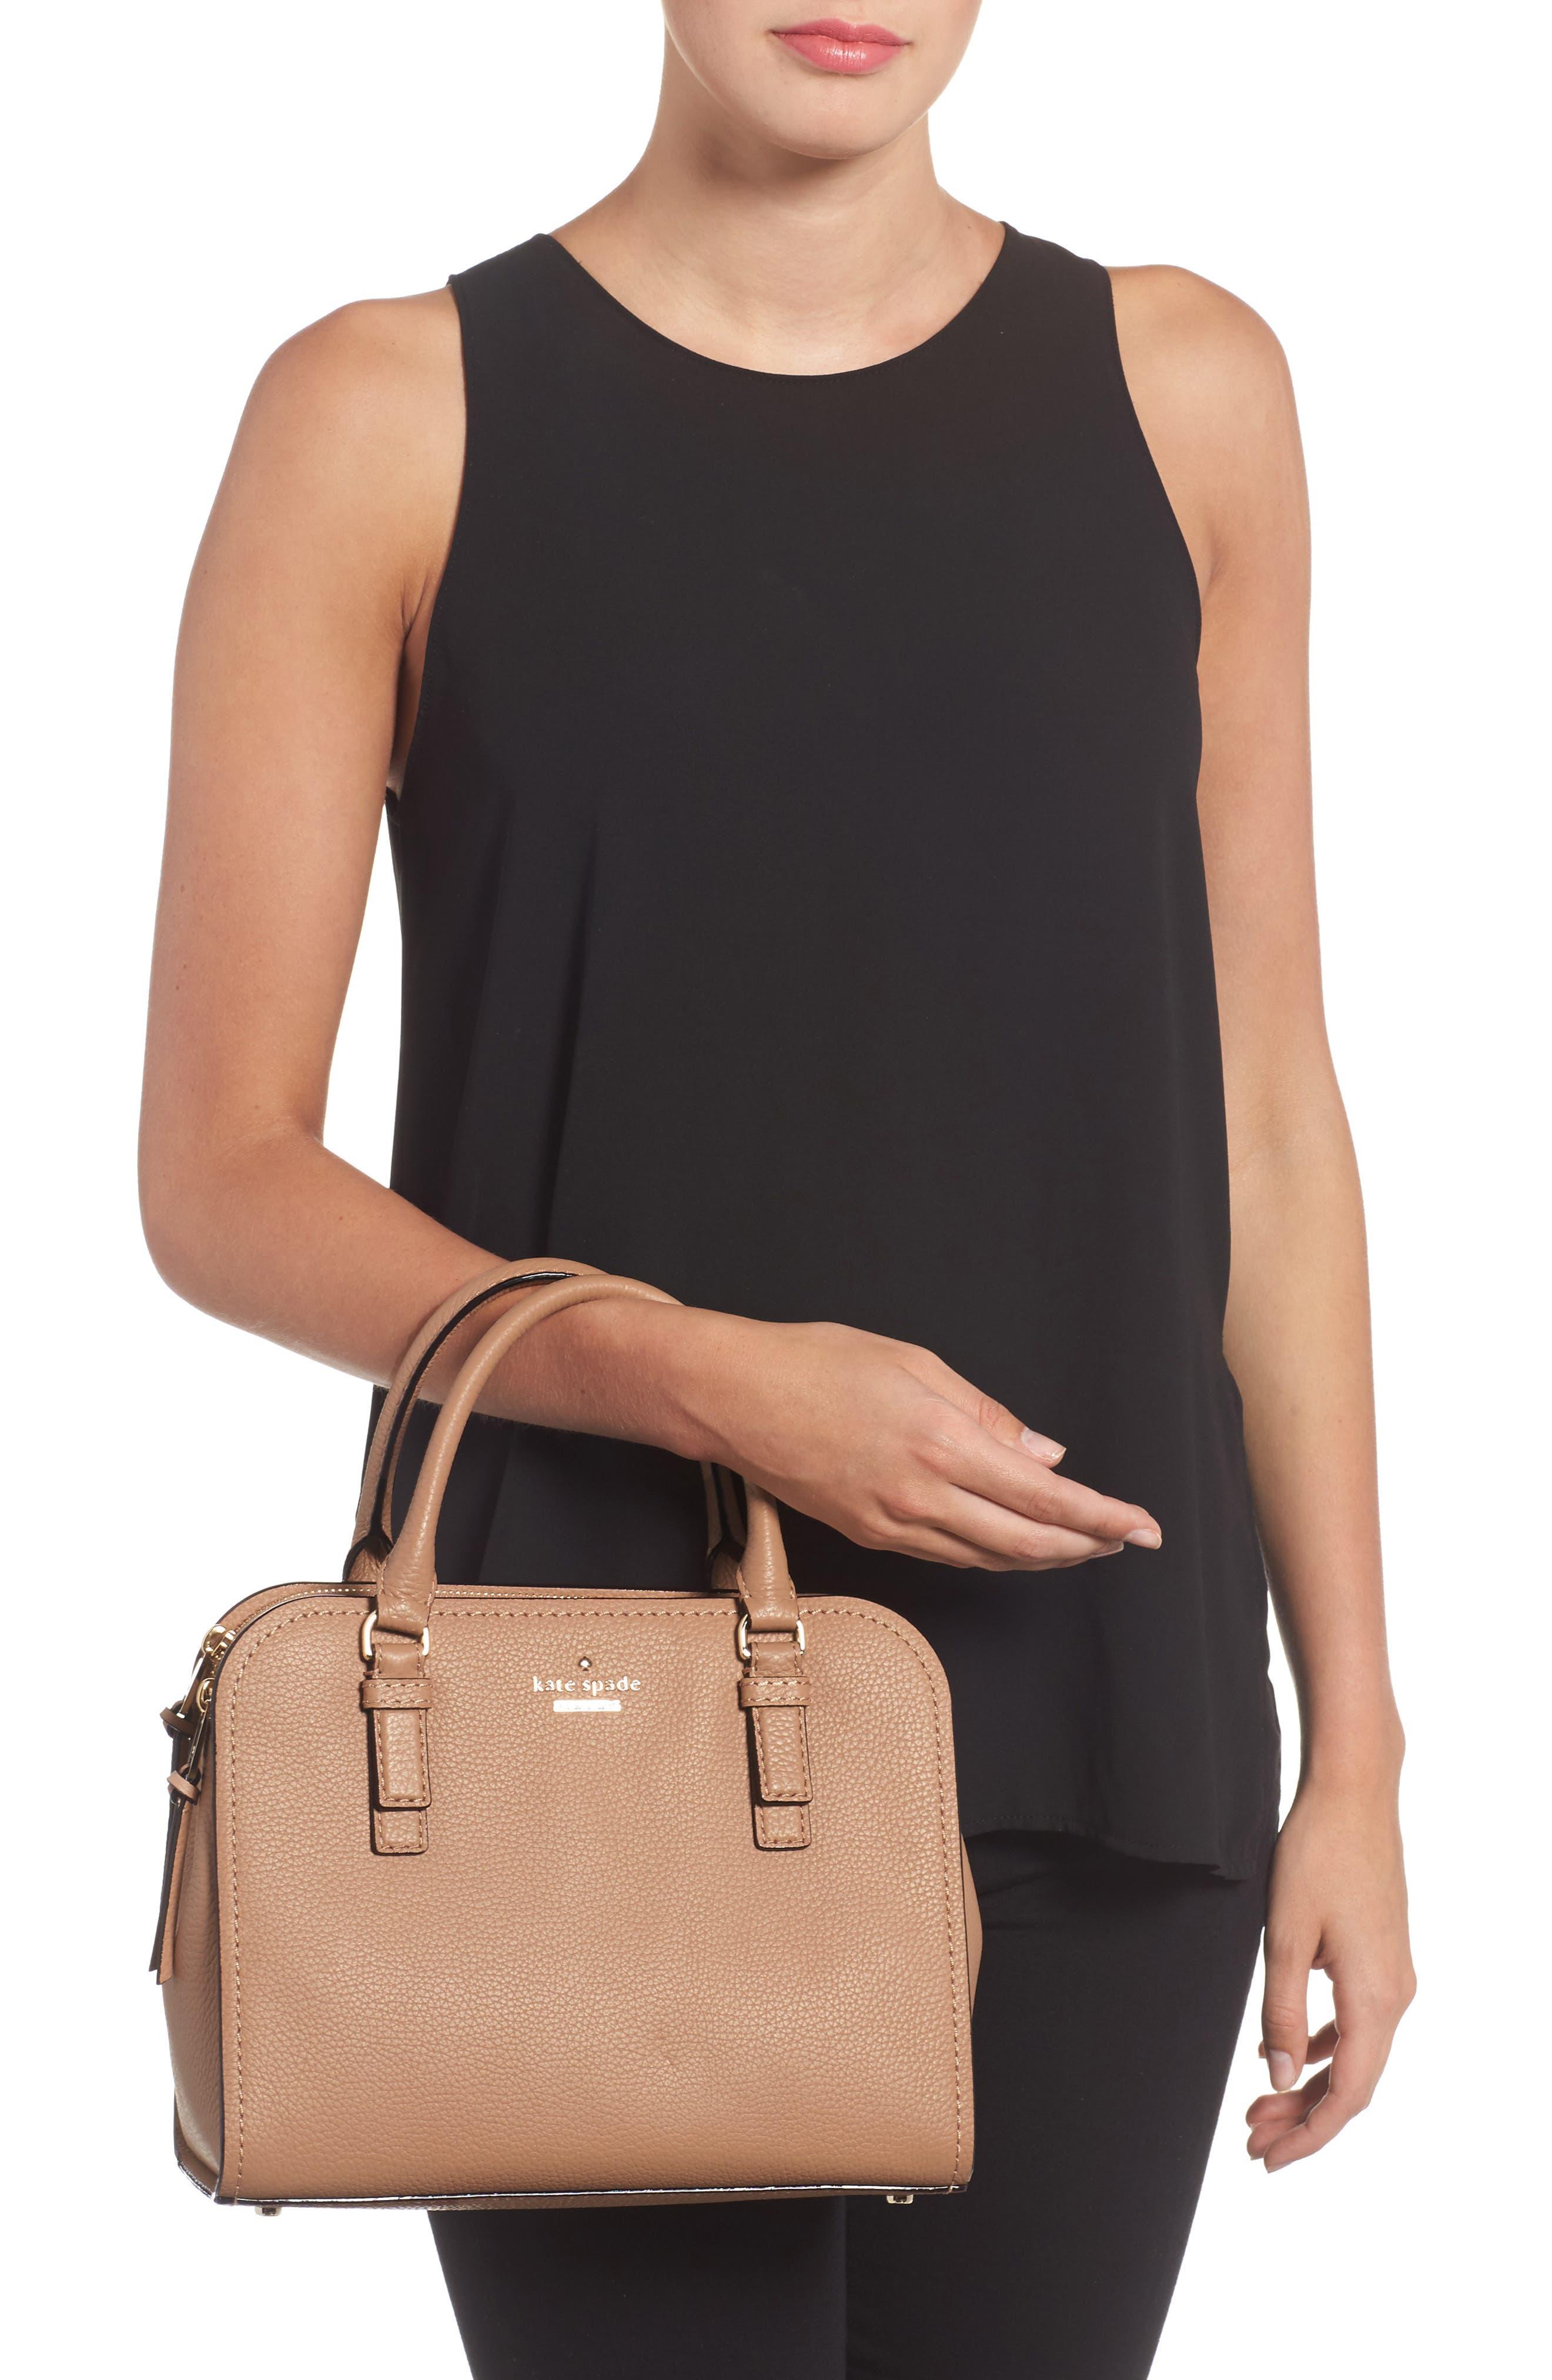 jackson street small kiernan leather top handle satchel,                             Alternate thumbnail 2, color,                             Hazel